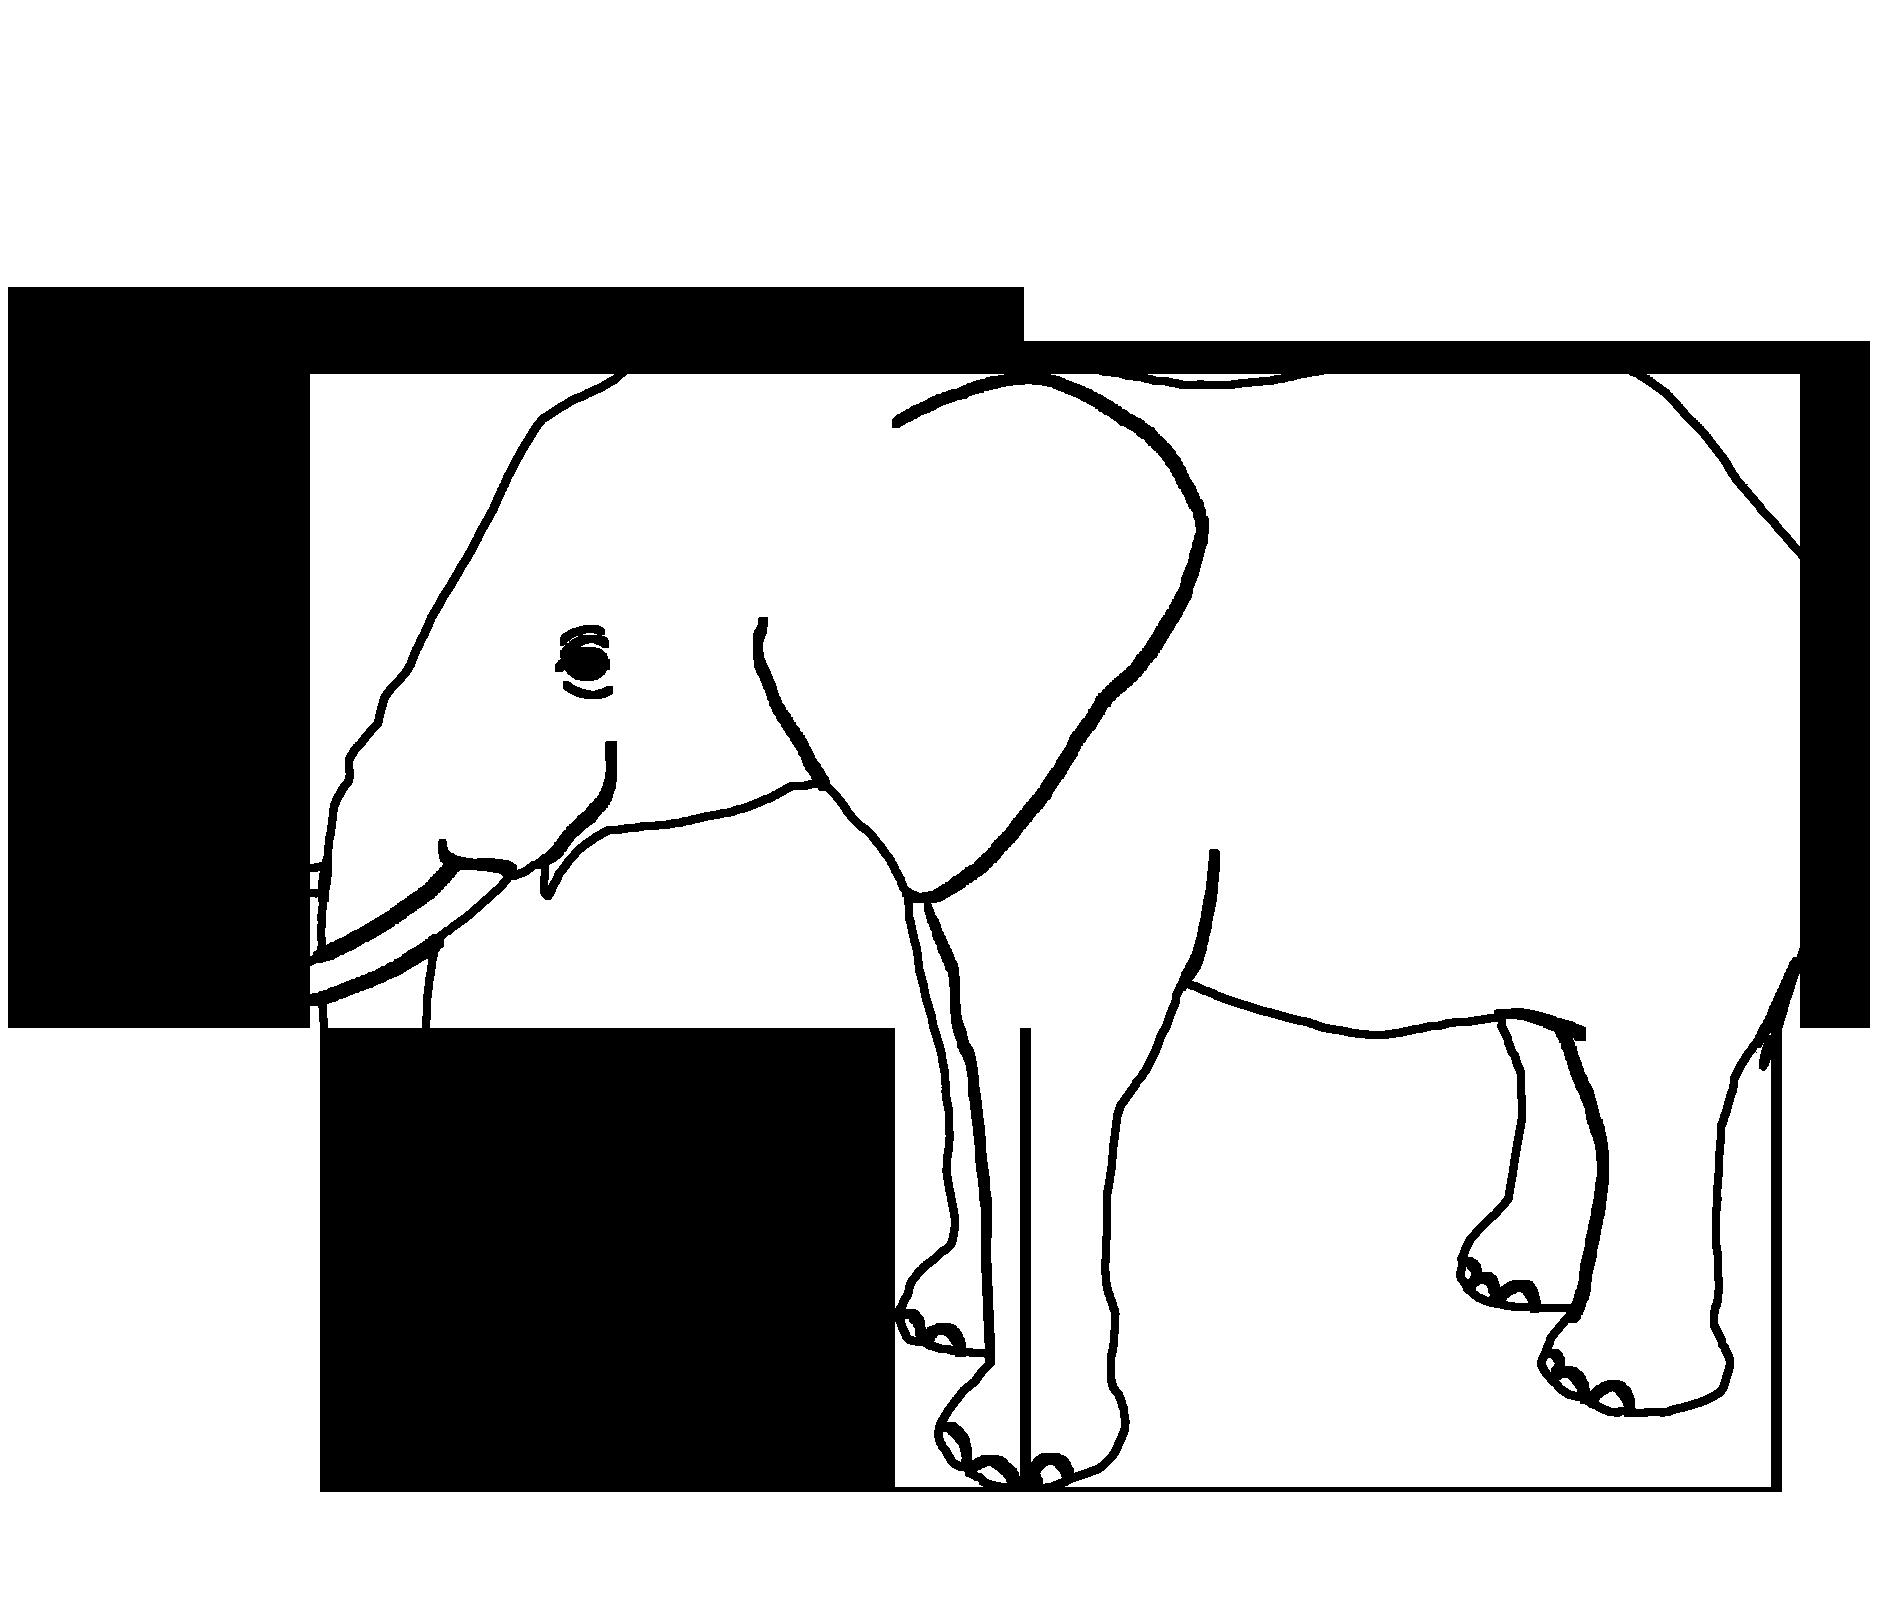 black outline of elephant silhouette